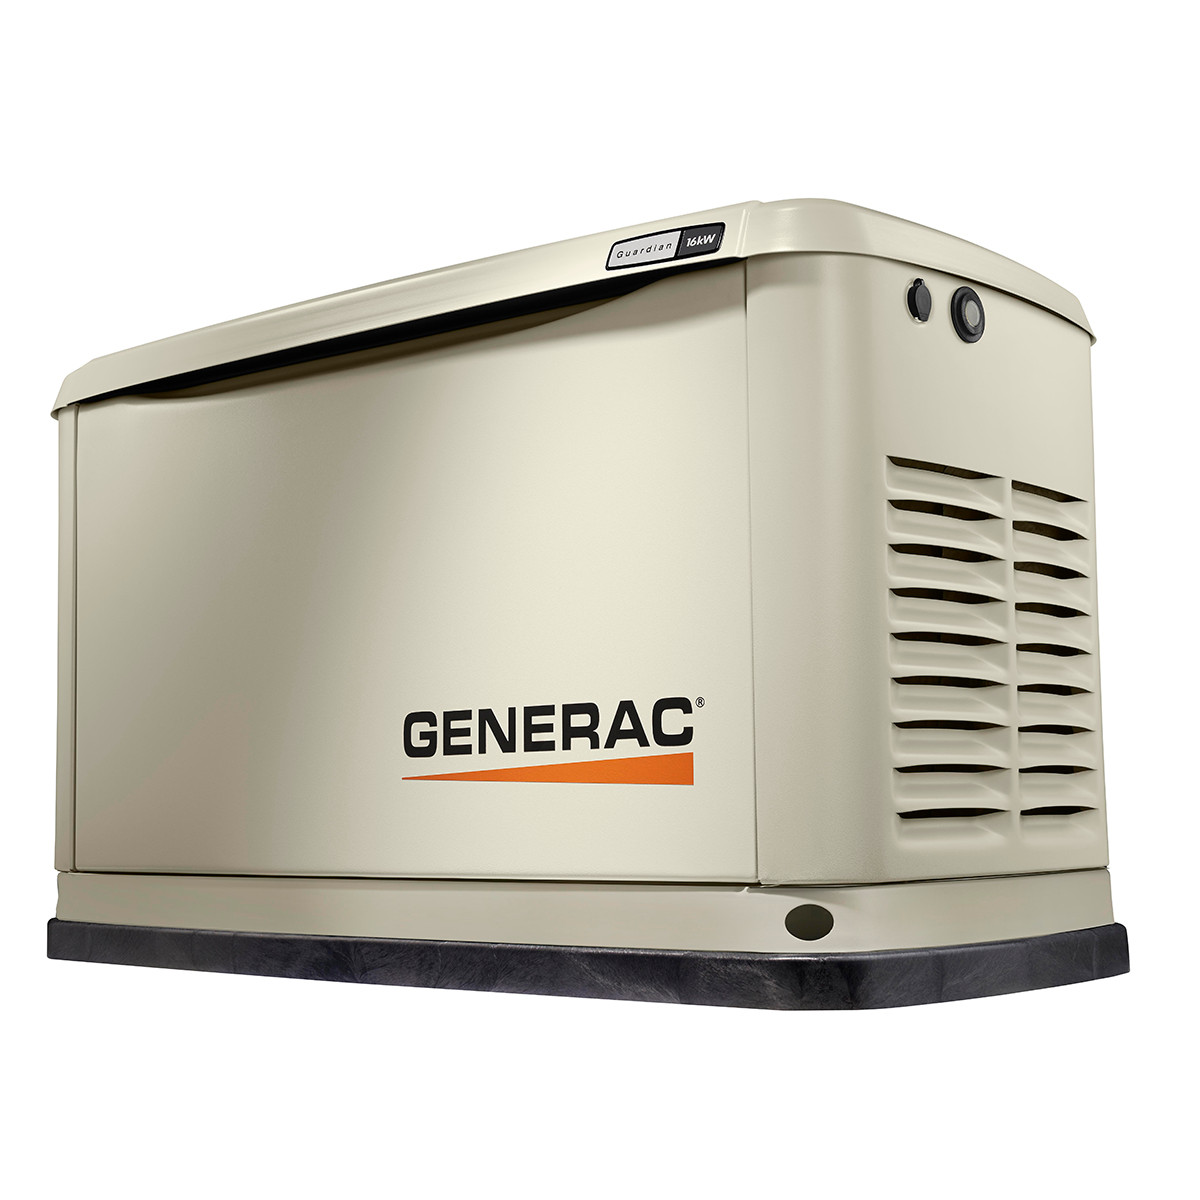 hight resolution of generac guardian 7035 16kw generator with wi fi